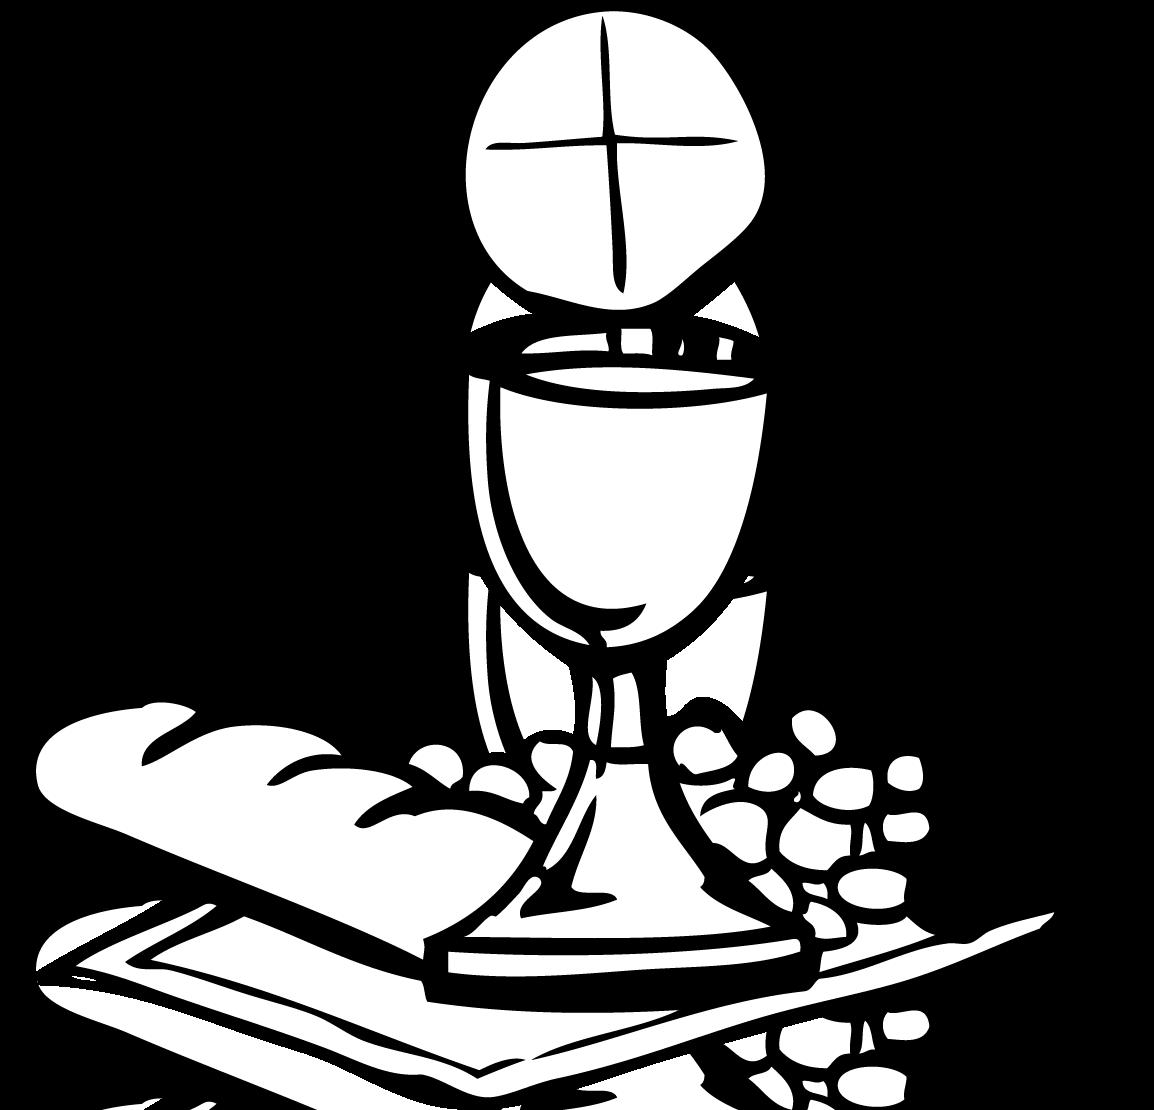 Eucharist Clipart - ClipArt Best